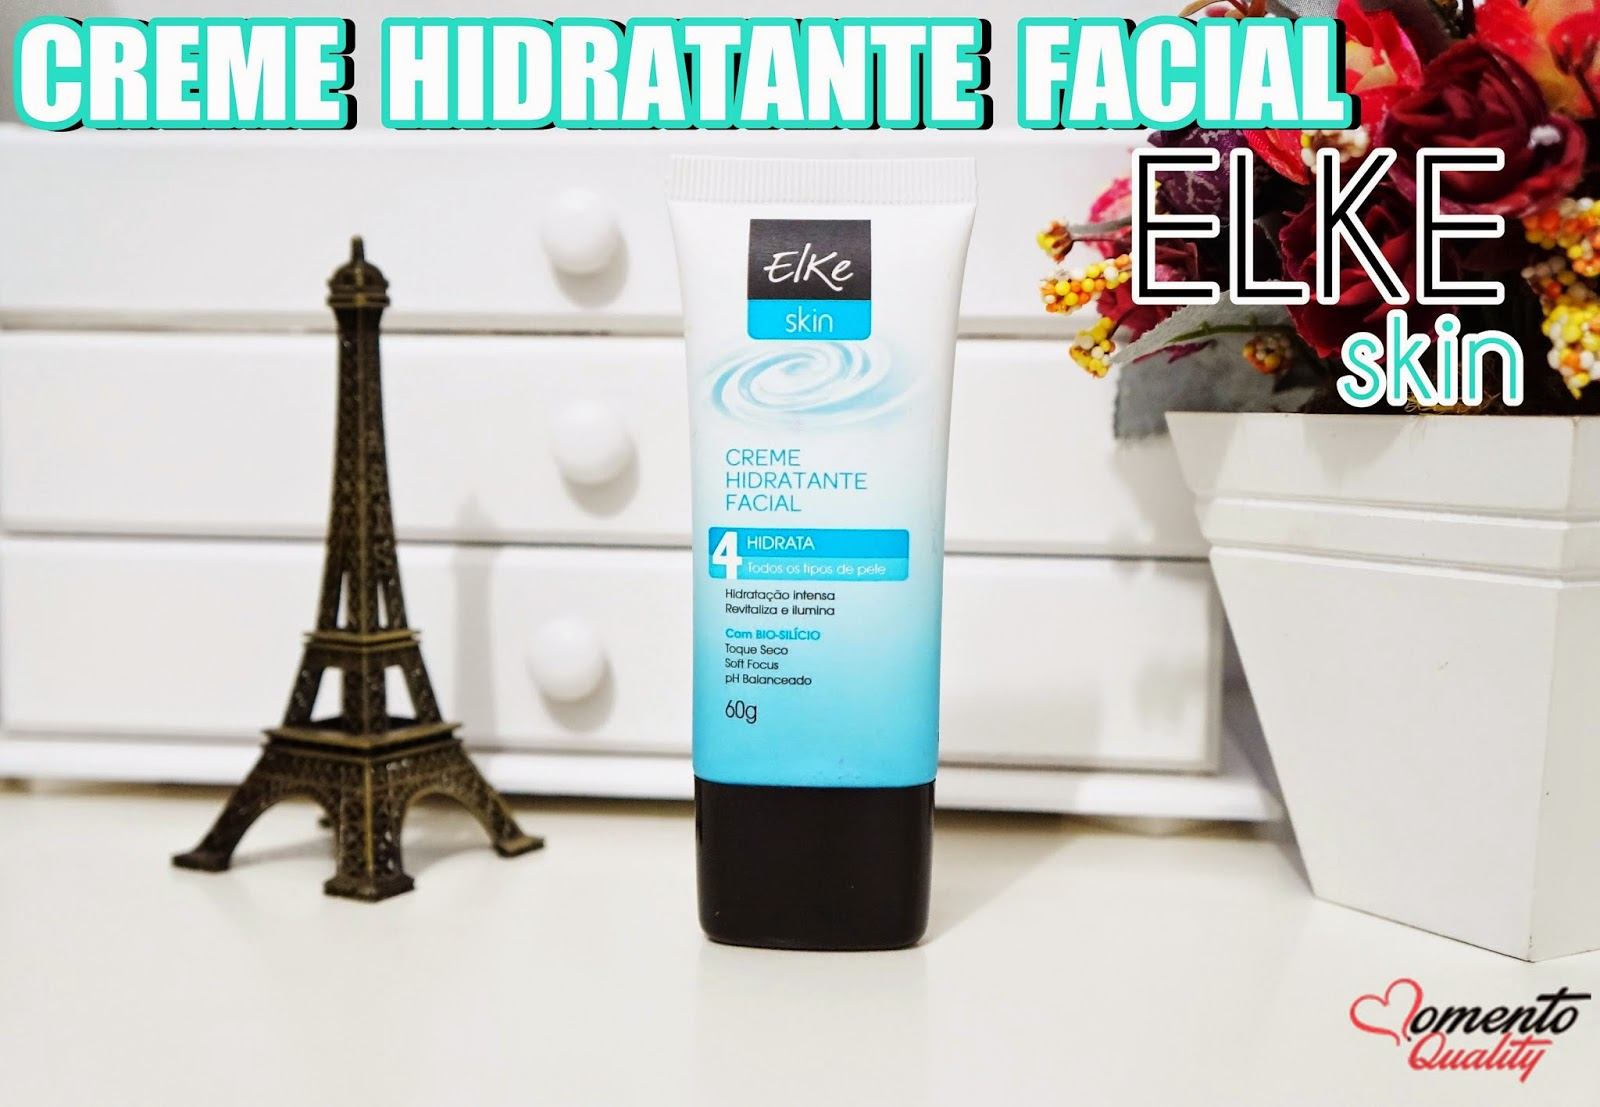 Creme Hidratante Facial Elke Skin